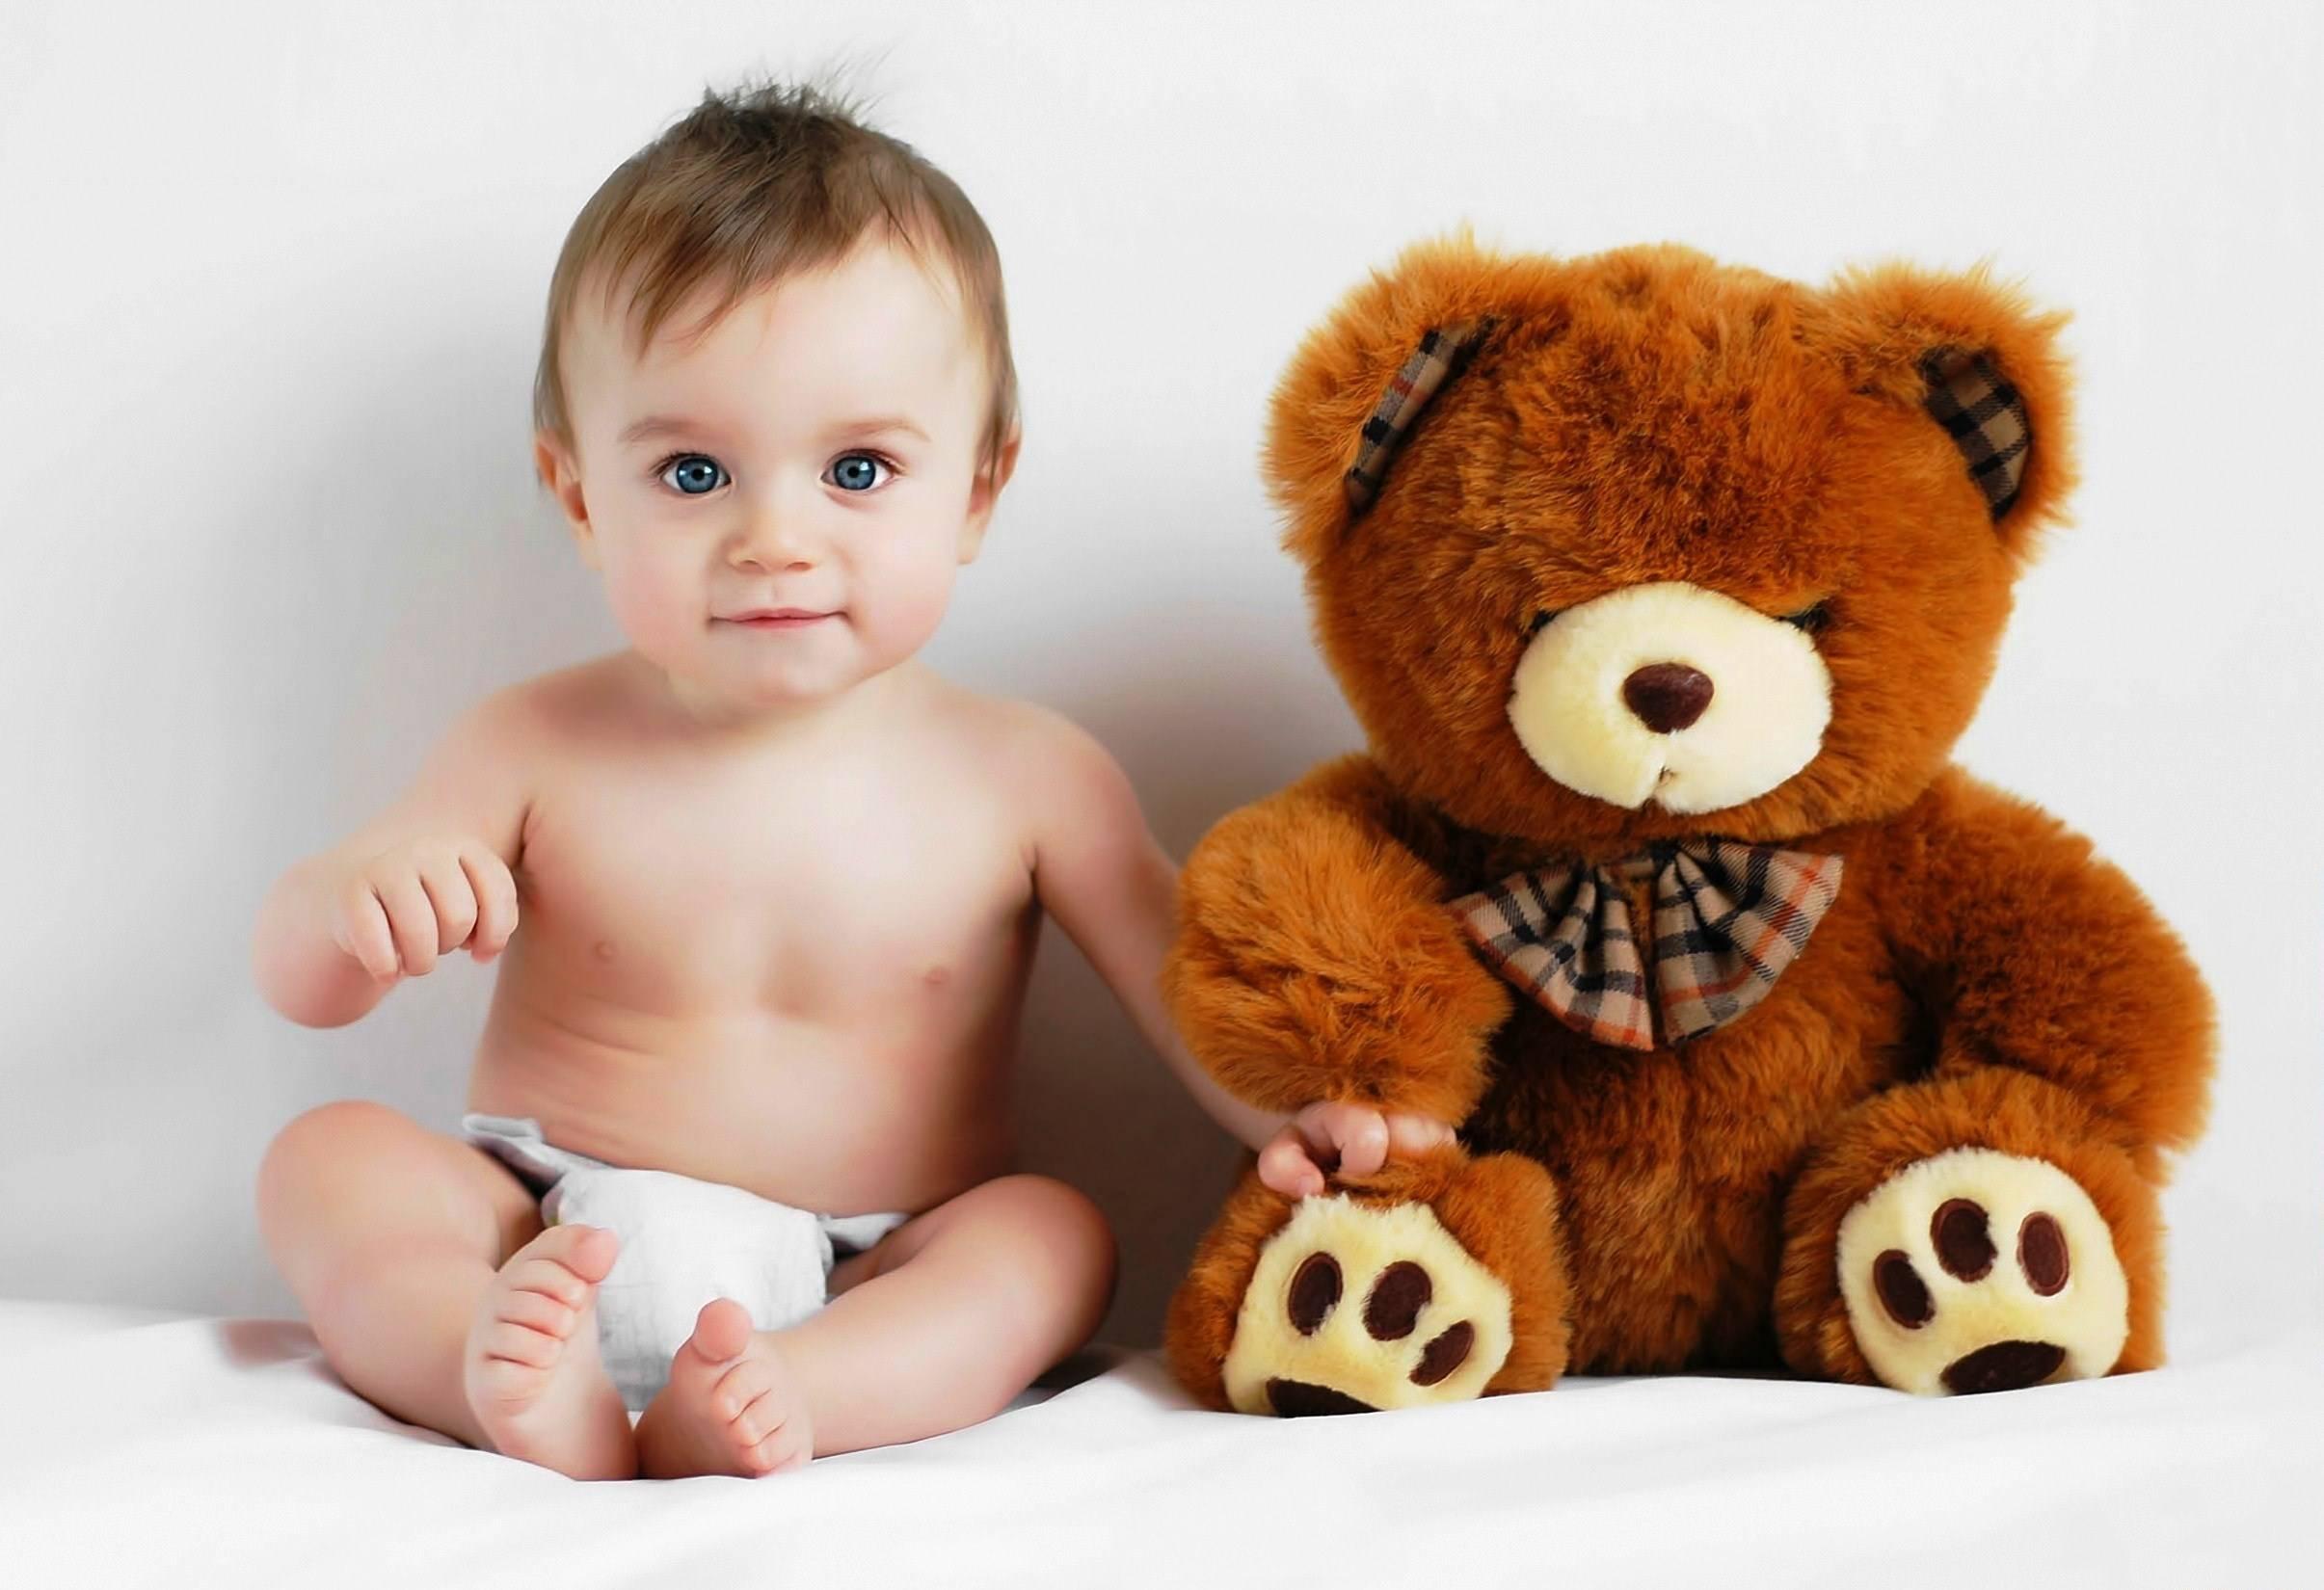 Характер ребенка по знаку Зодиака. Гороскоп родителям на заметку!